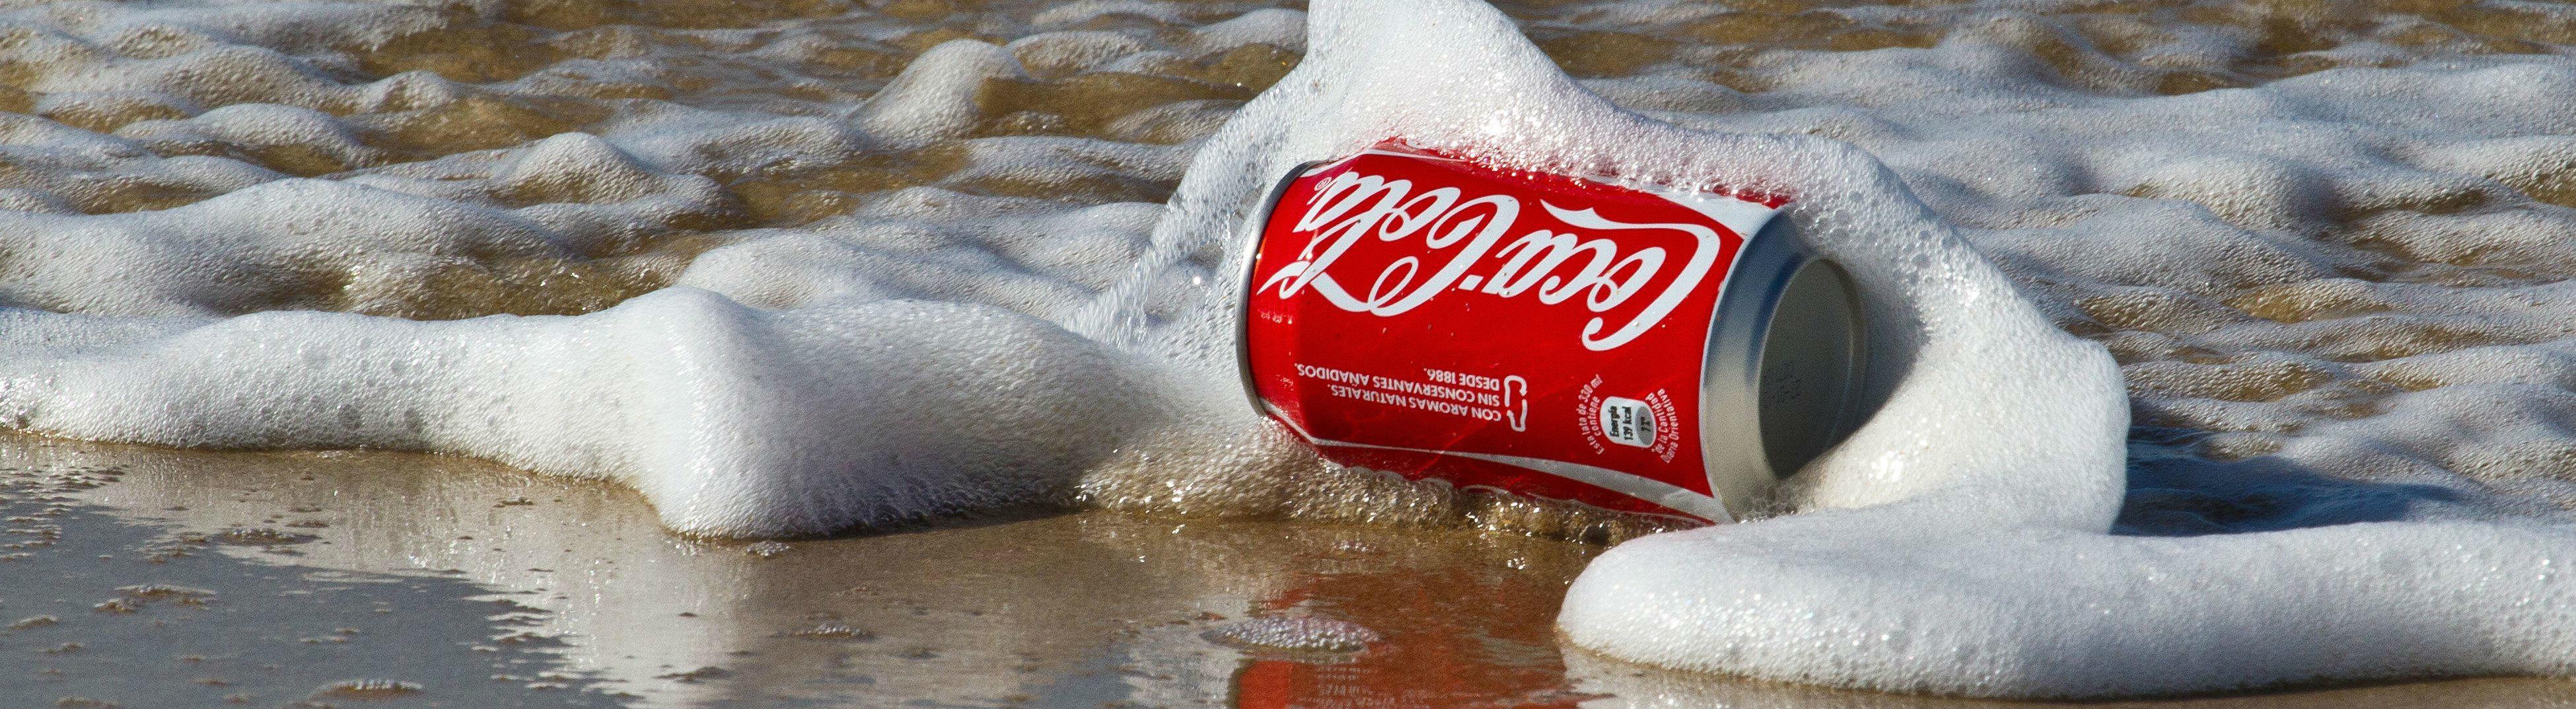 Eine Coladose im Meer.